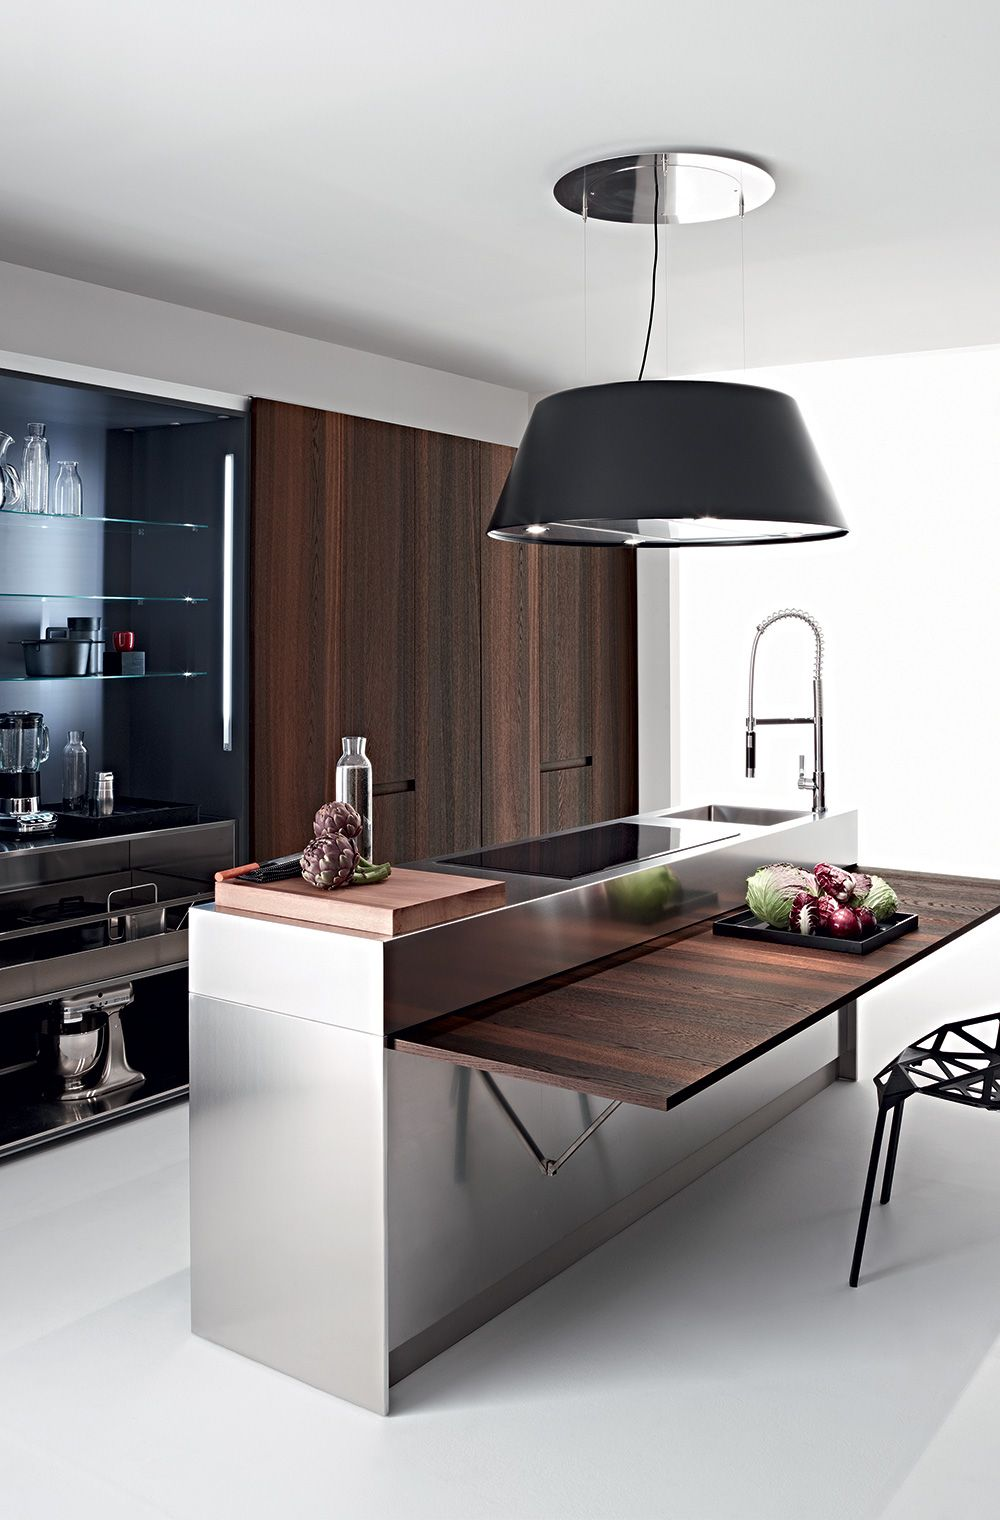 Slim & Wing Table  Elmar Cucine  Elmar Slim  Pinterest Gorgeous Space Saving Kitchen Designs Decorating Design